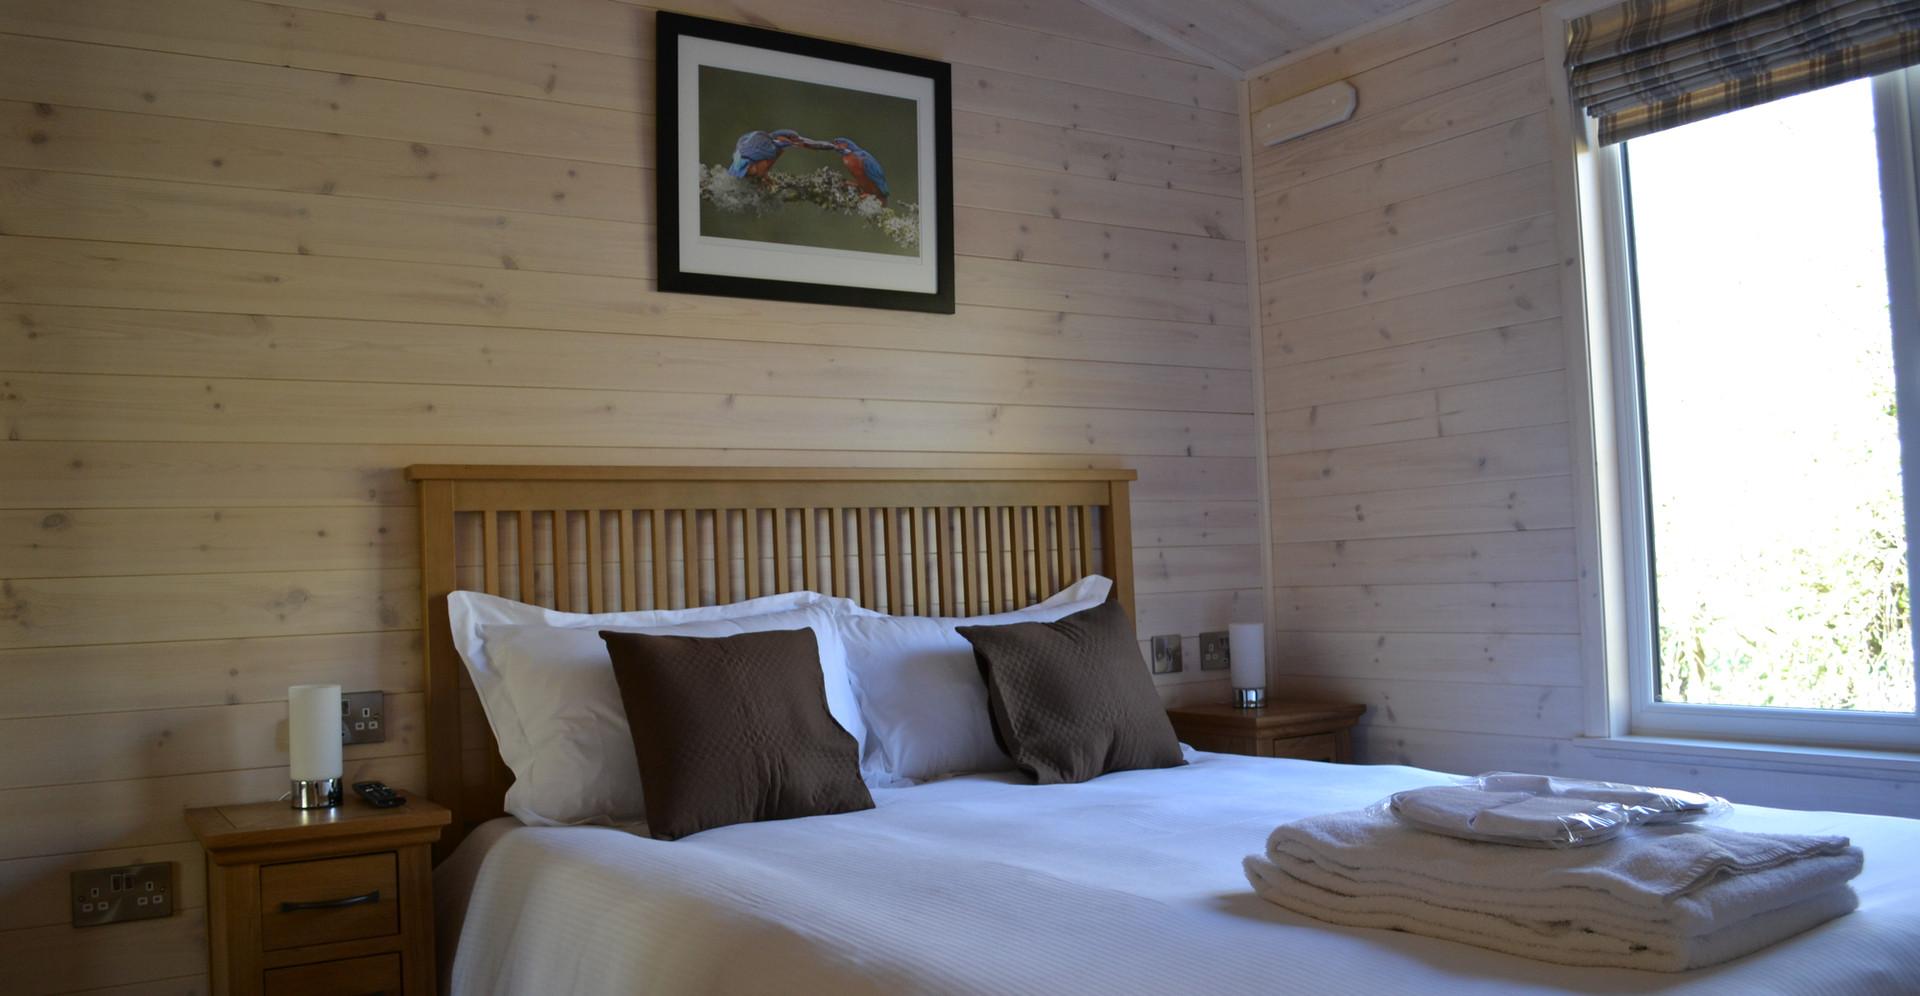 Simba hybrid mattress & pillows